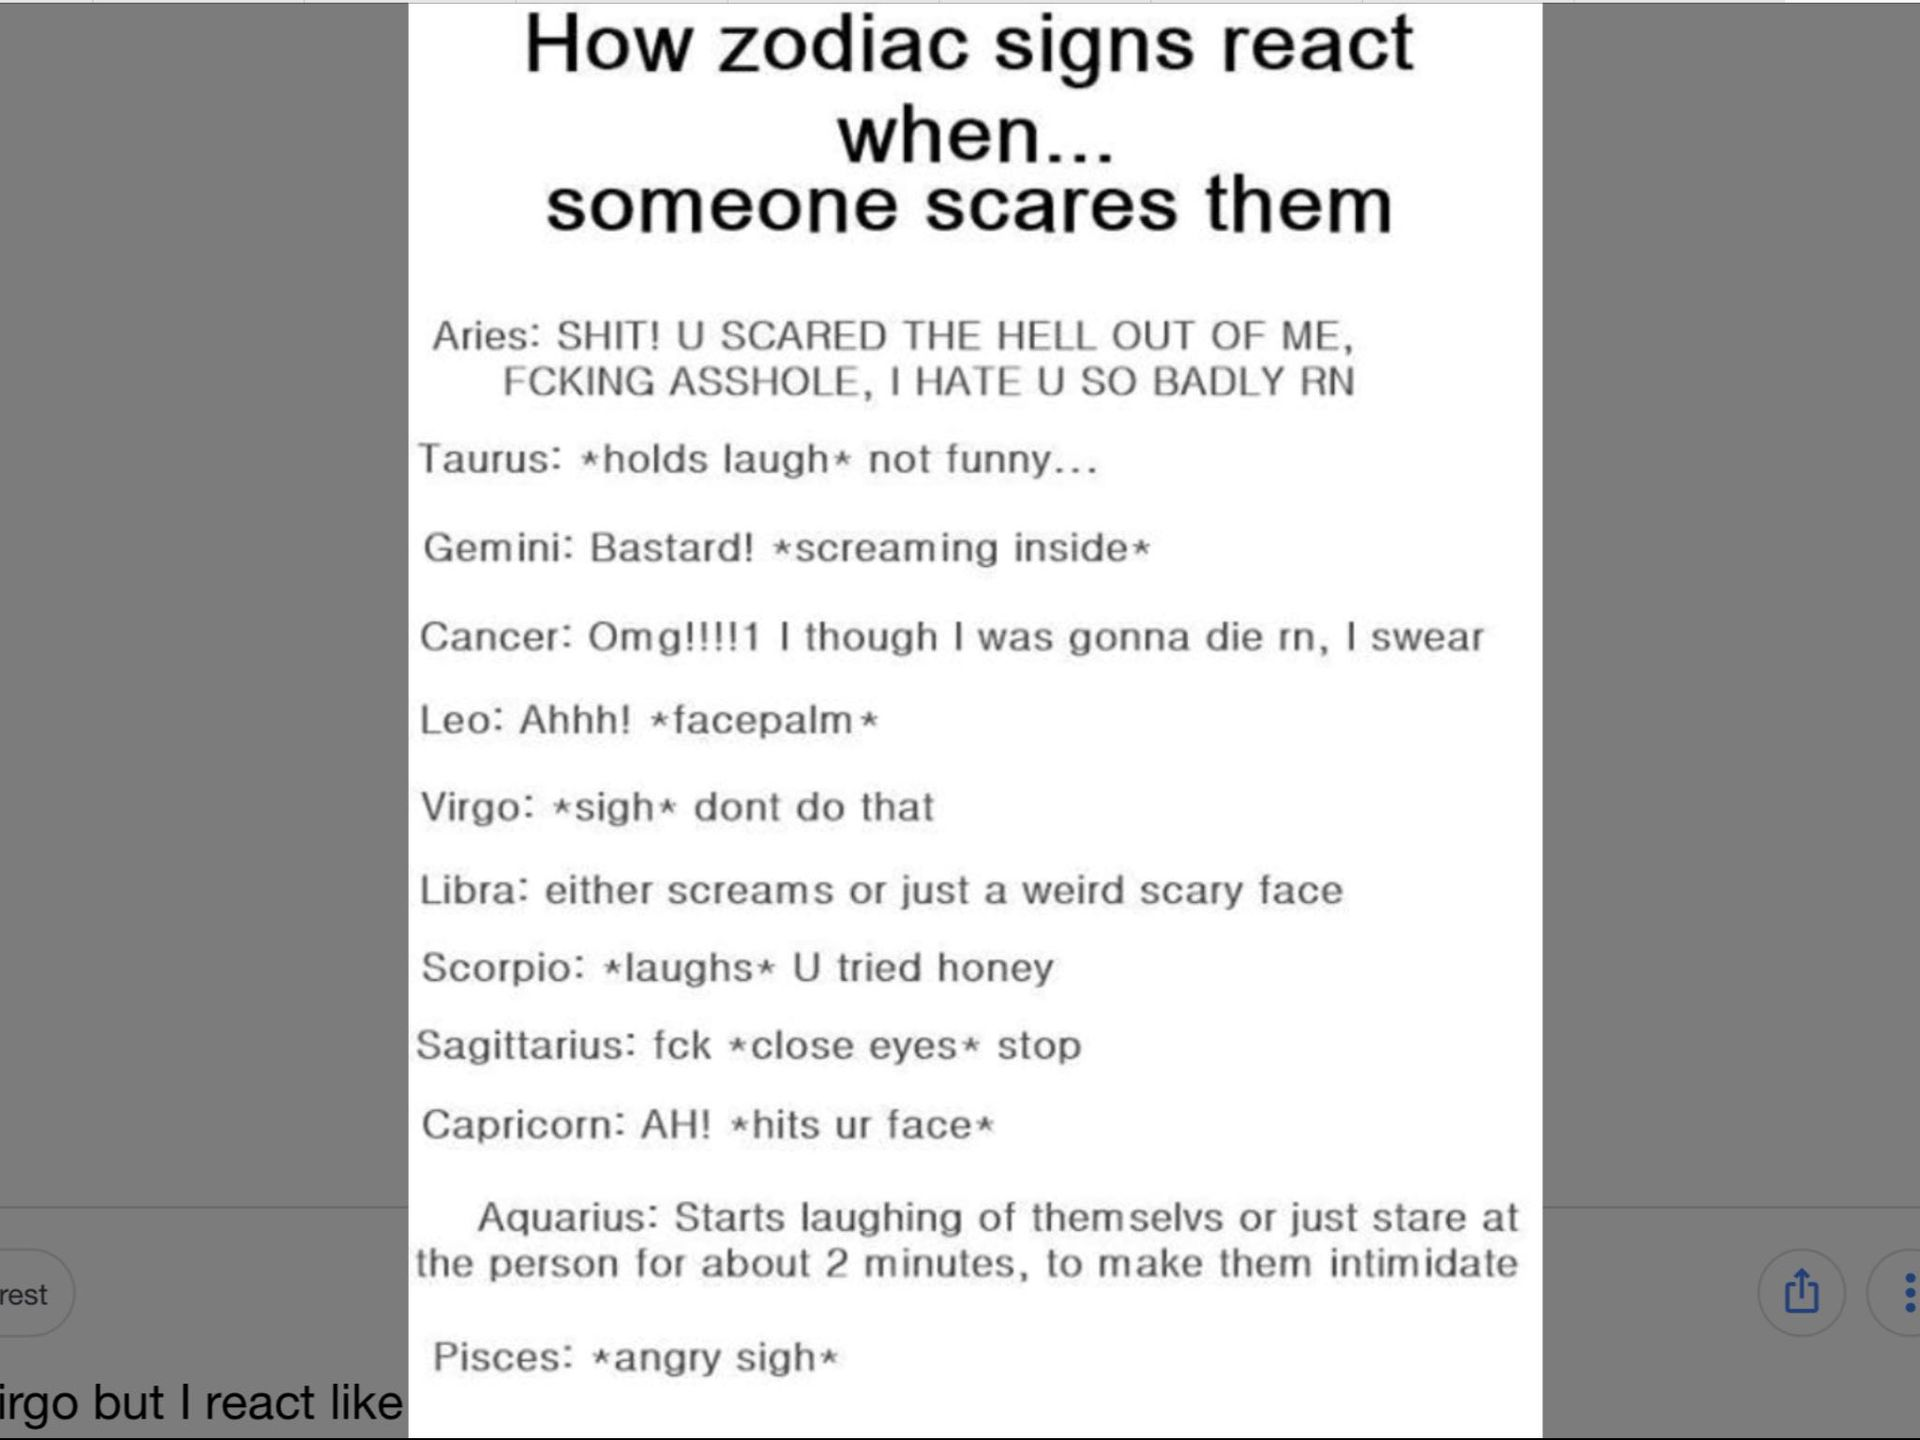 Zodiac crap - How the zodiacs react when someone scares them - Wattpad